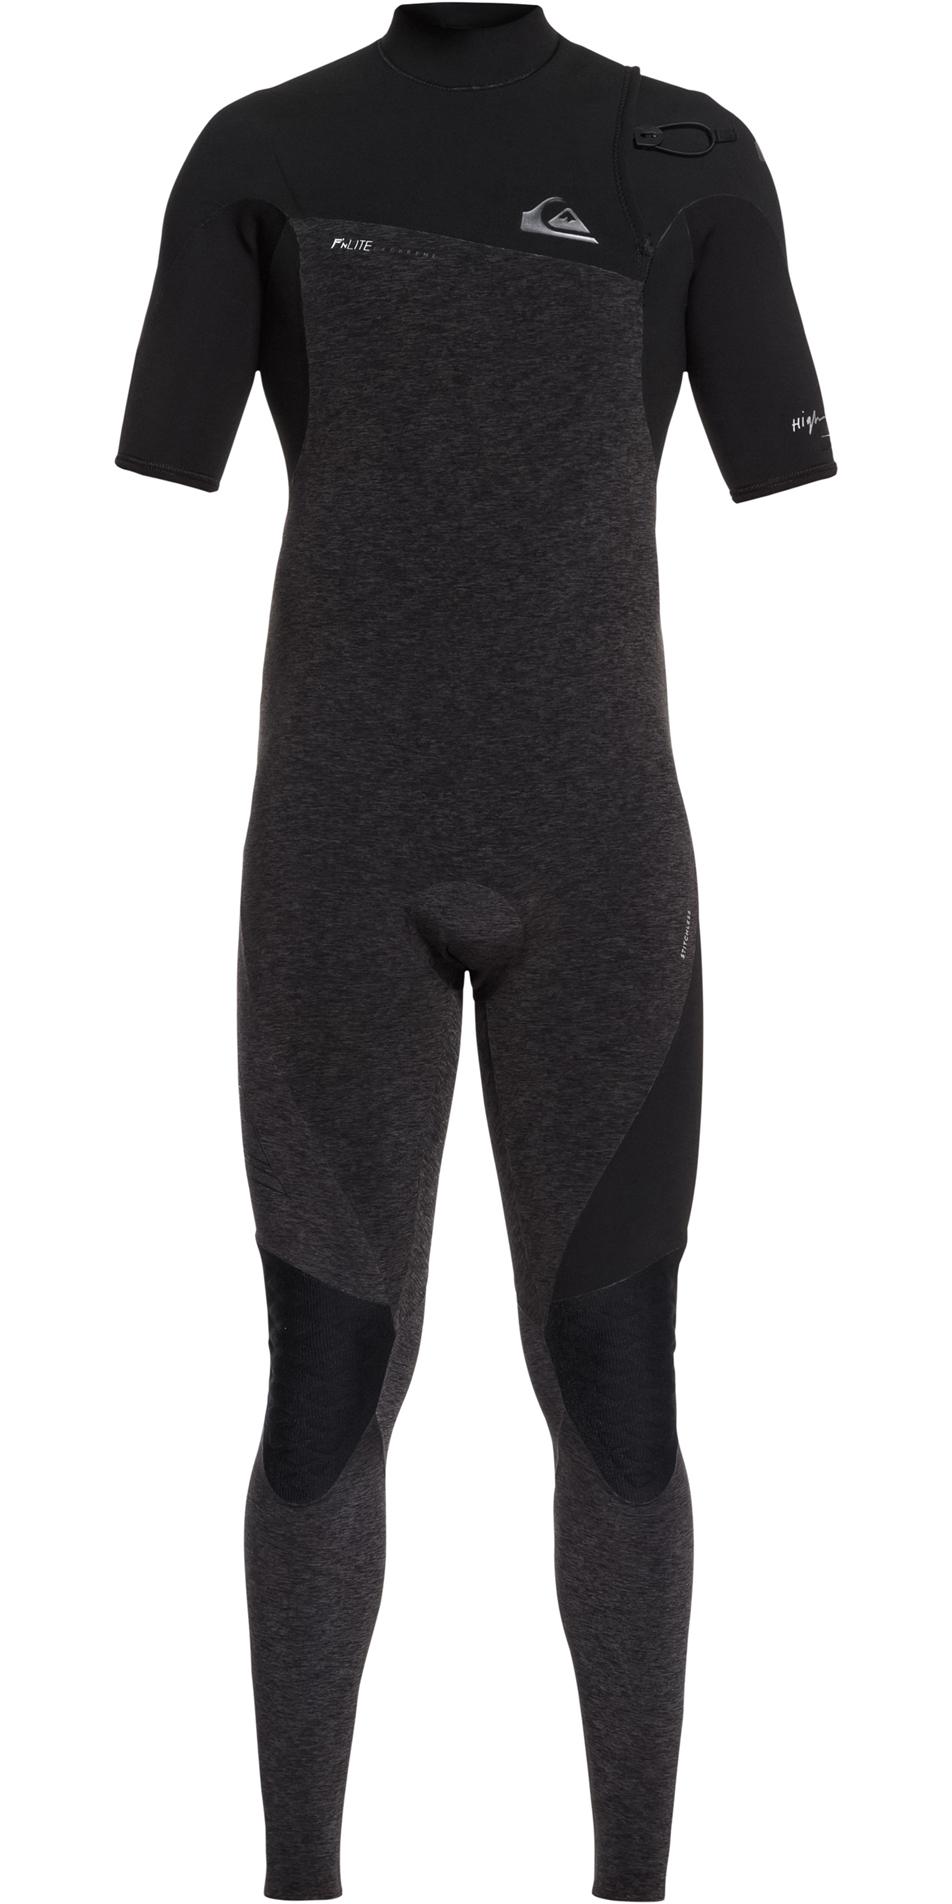 f70f618a1fe9 2019 Quiksilver Highline 2mm Zipperless Short Sleeve Wetsuit Black  EQYW303009 ...